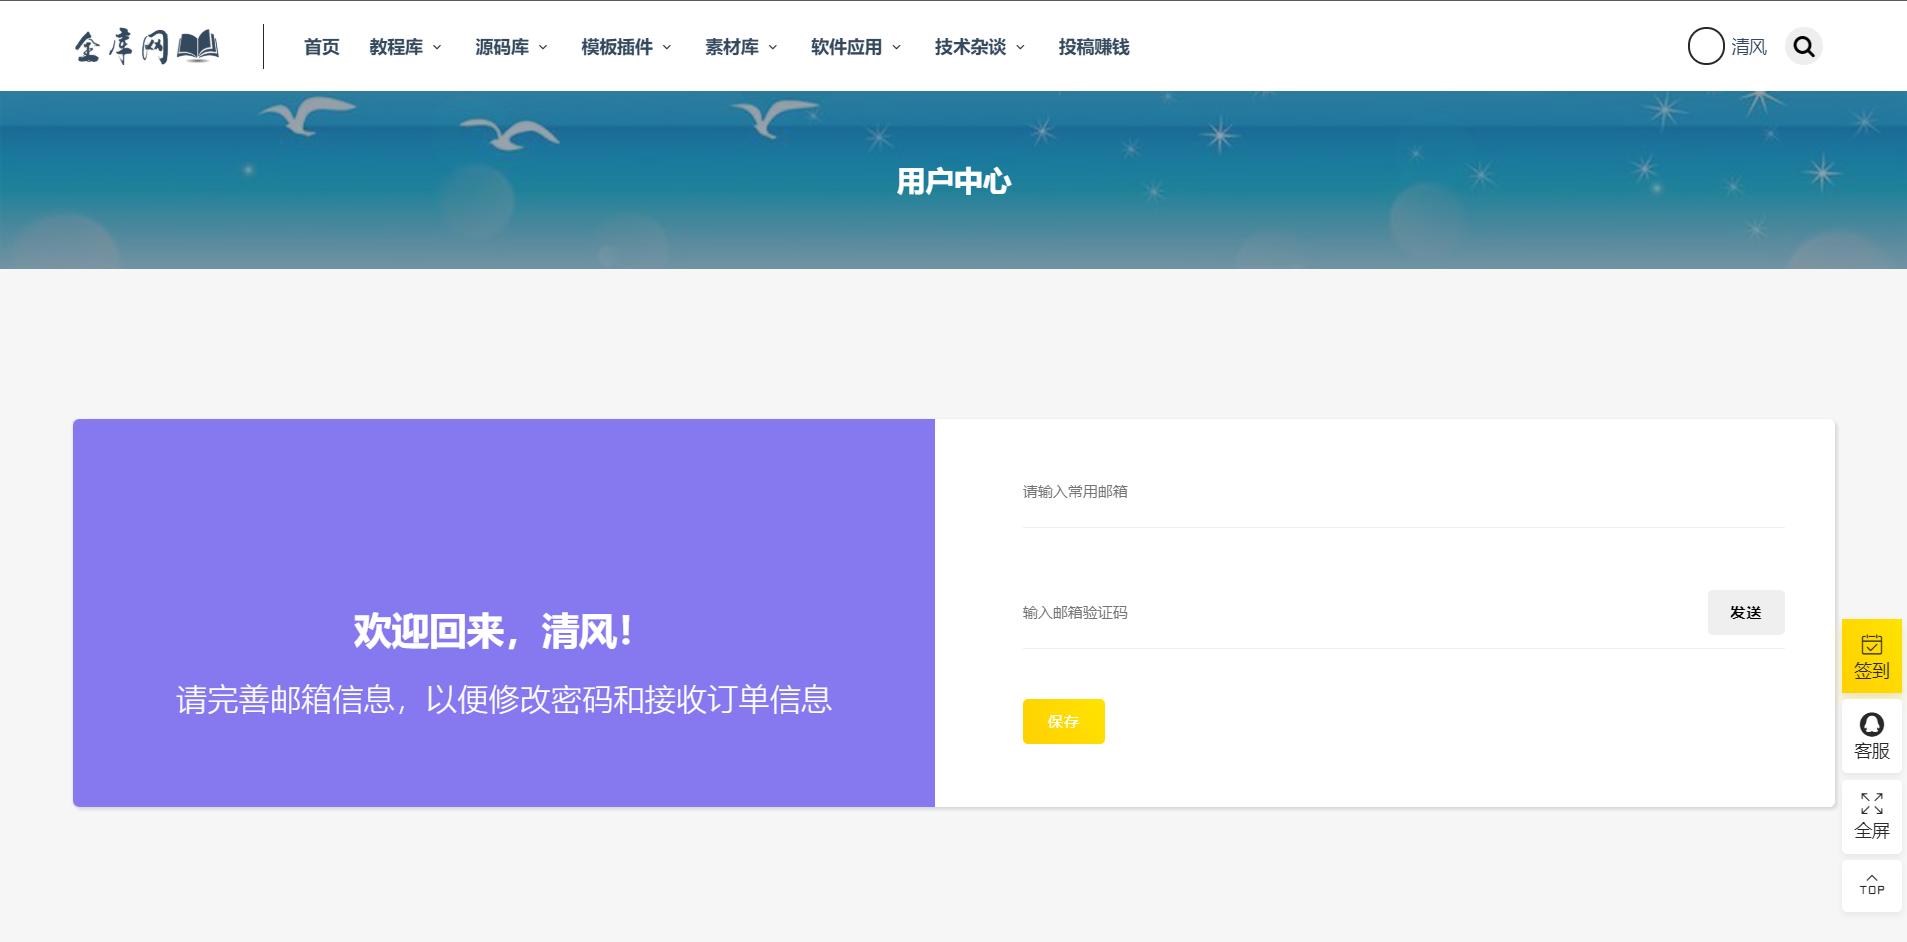 Ripro主题wordpress网站强制QQ微信快速登录用户修改绑定邮箱的功能纯代码实现